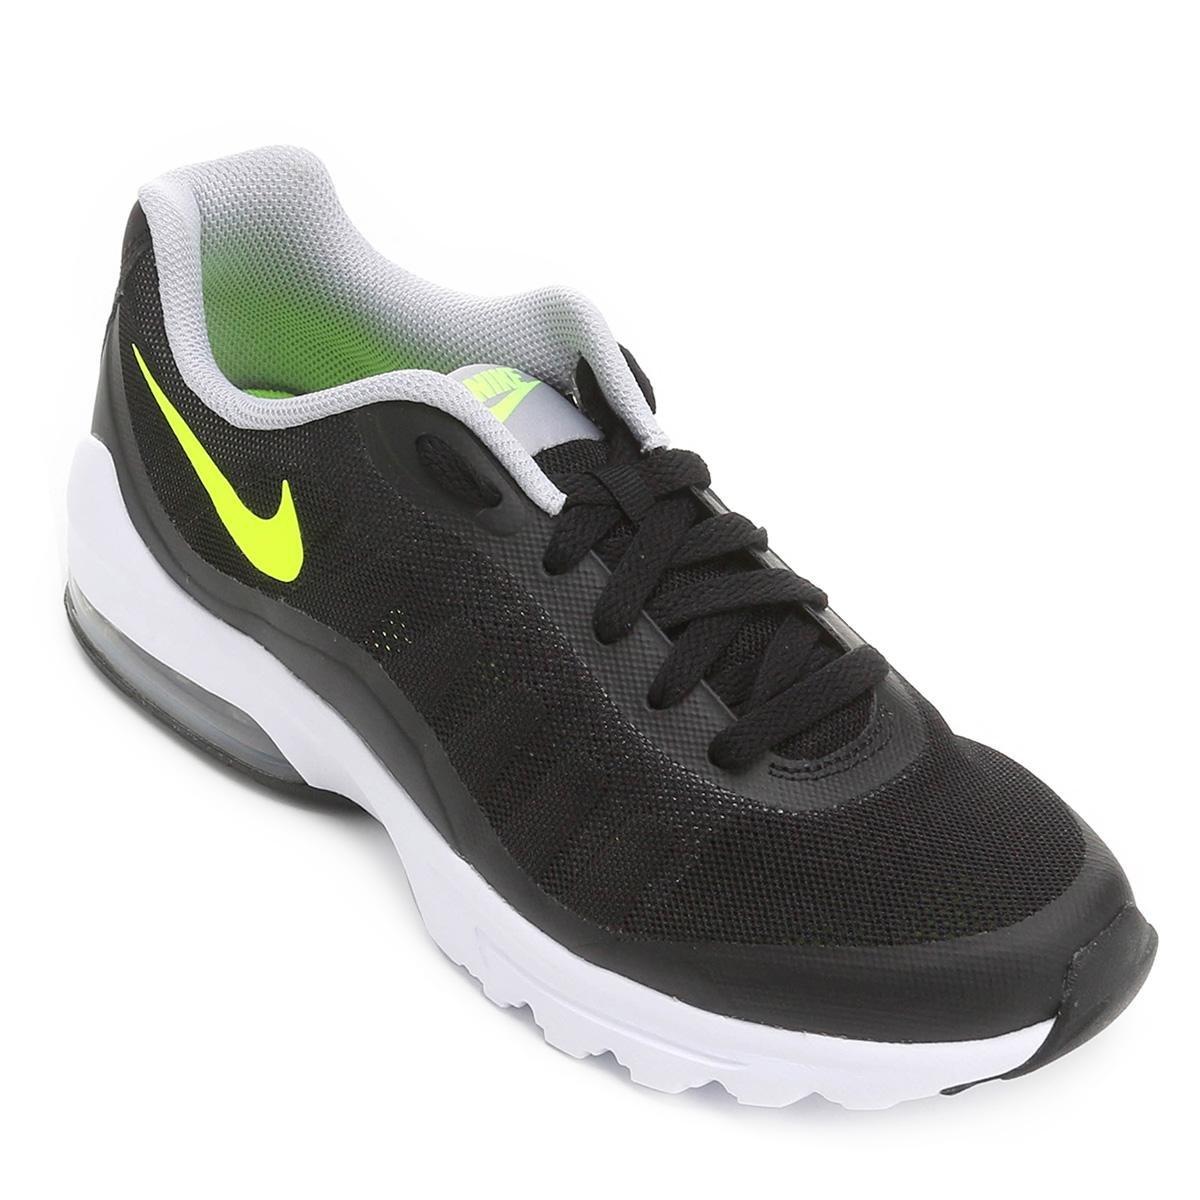 b94161b7a Tênis Nike Air Max Invigor Masculino - Preto e Cinza - Compre Agora ...